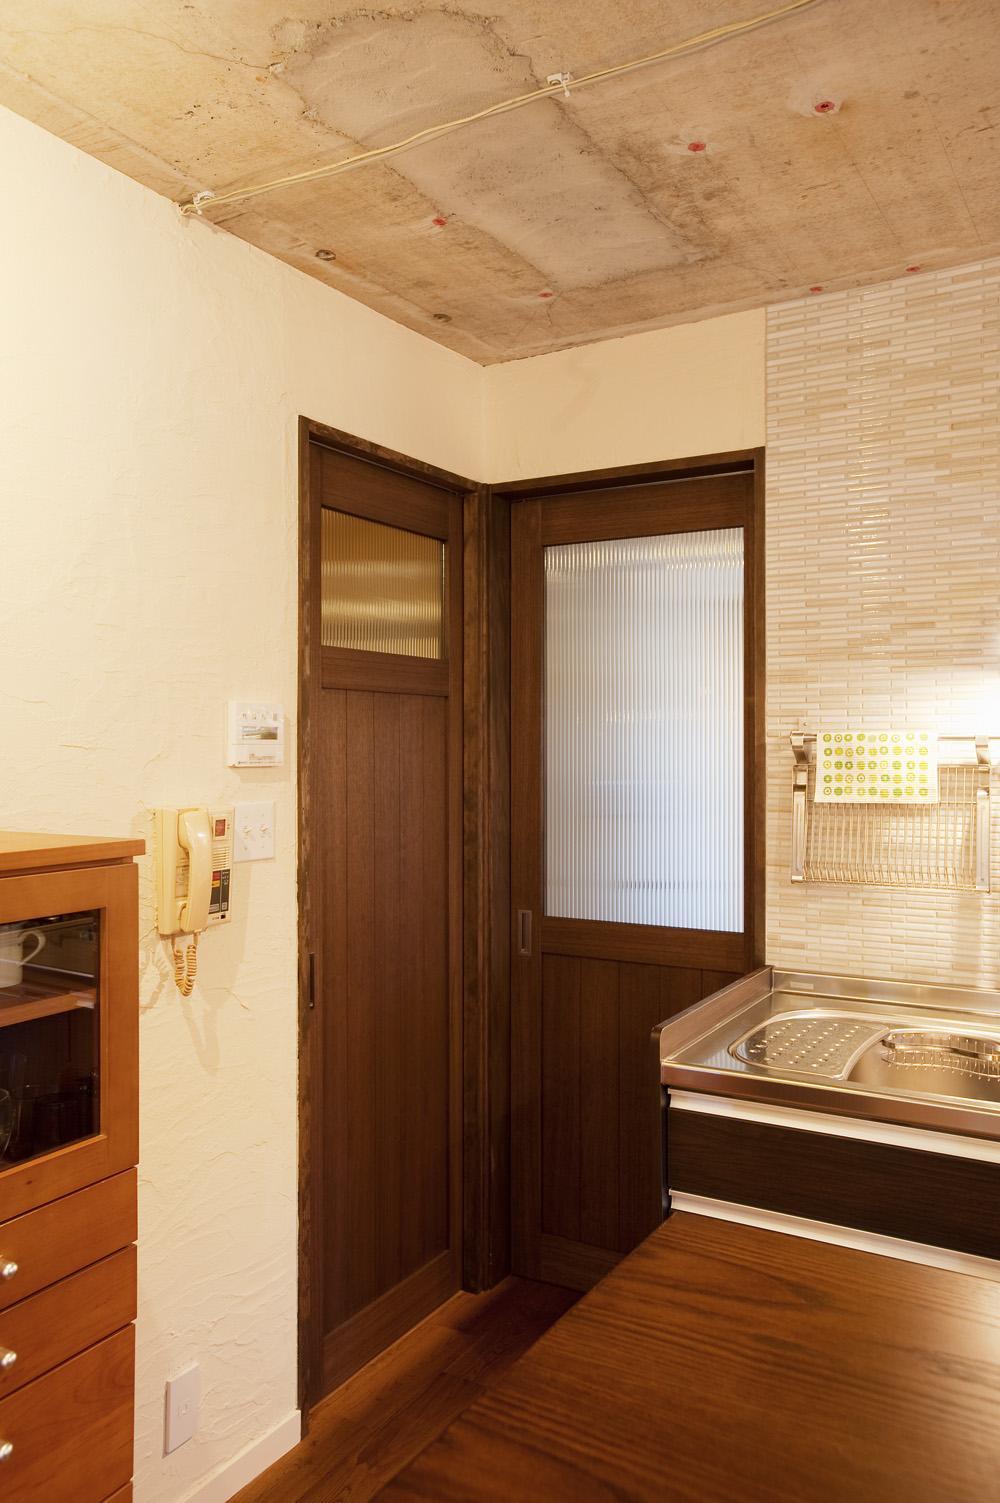 T邸・さわやかな風の吹き抜ける住まいの部屋 リビングドアと洗面室ドア